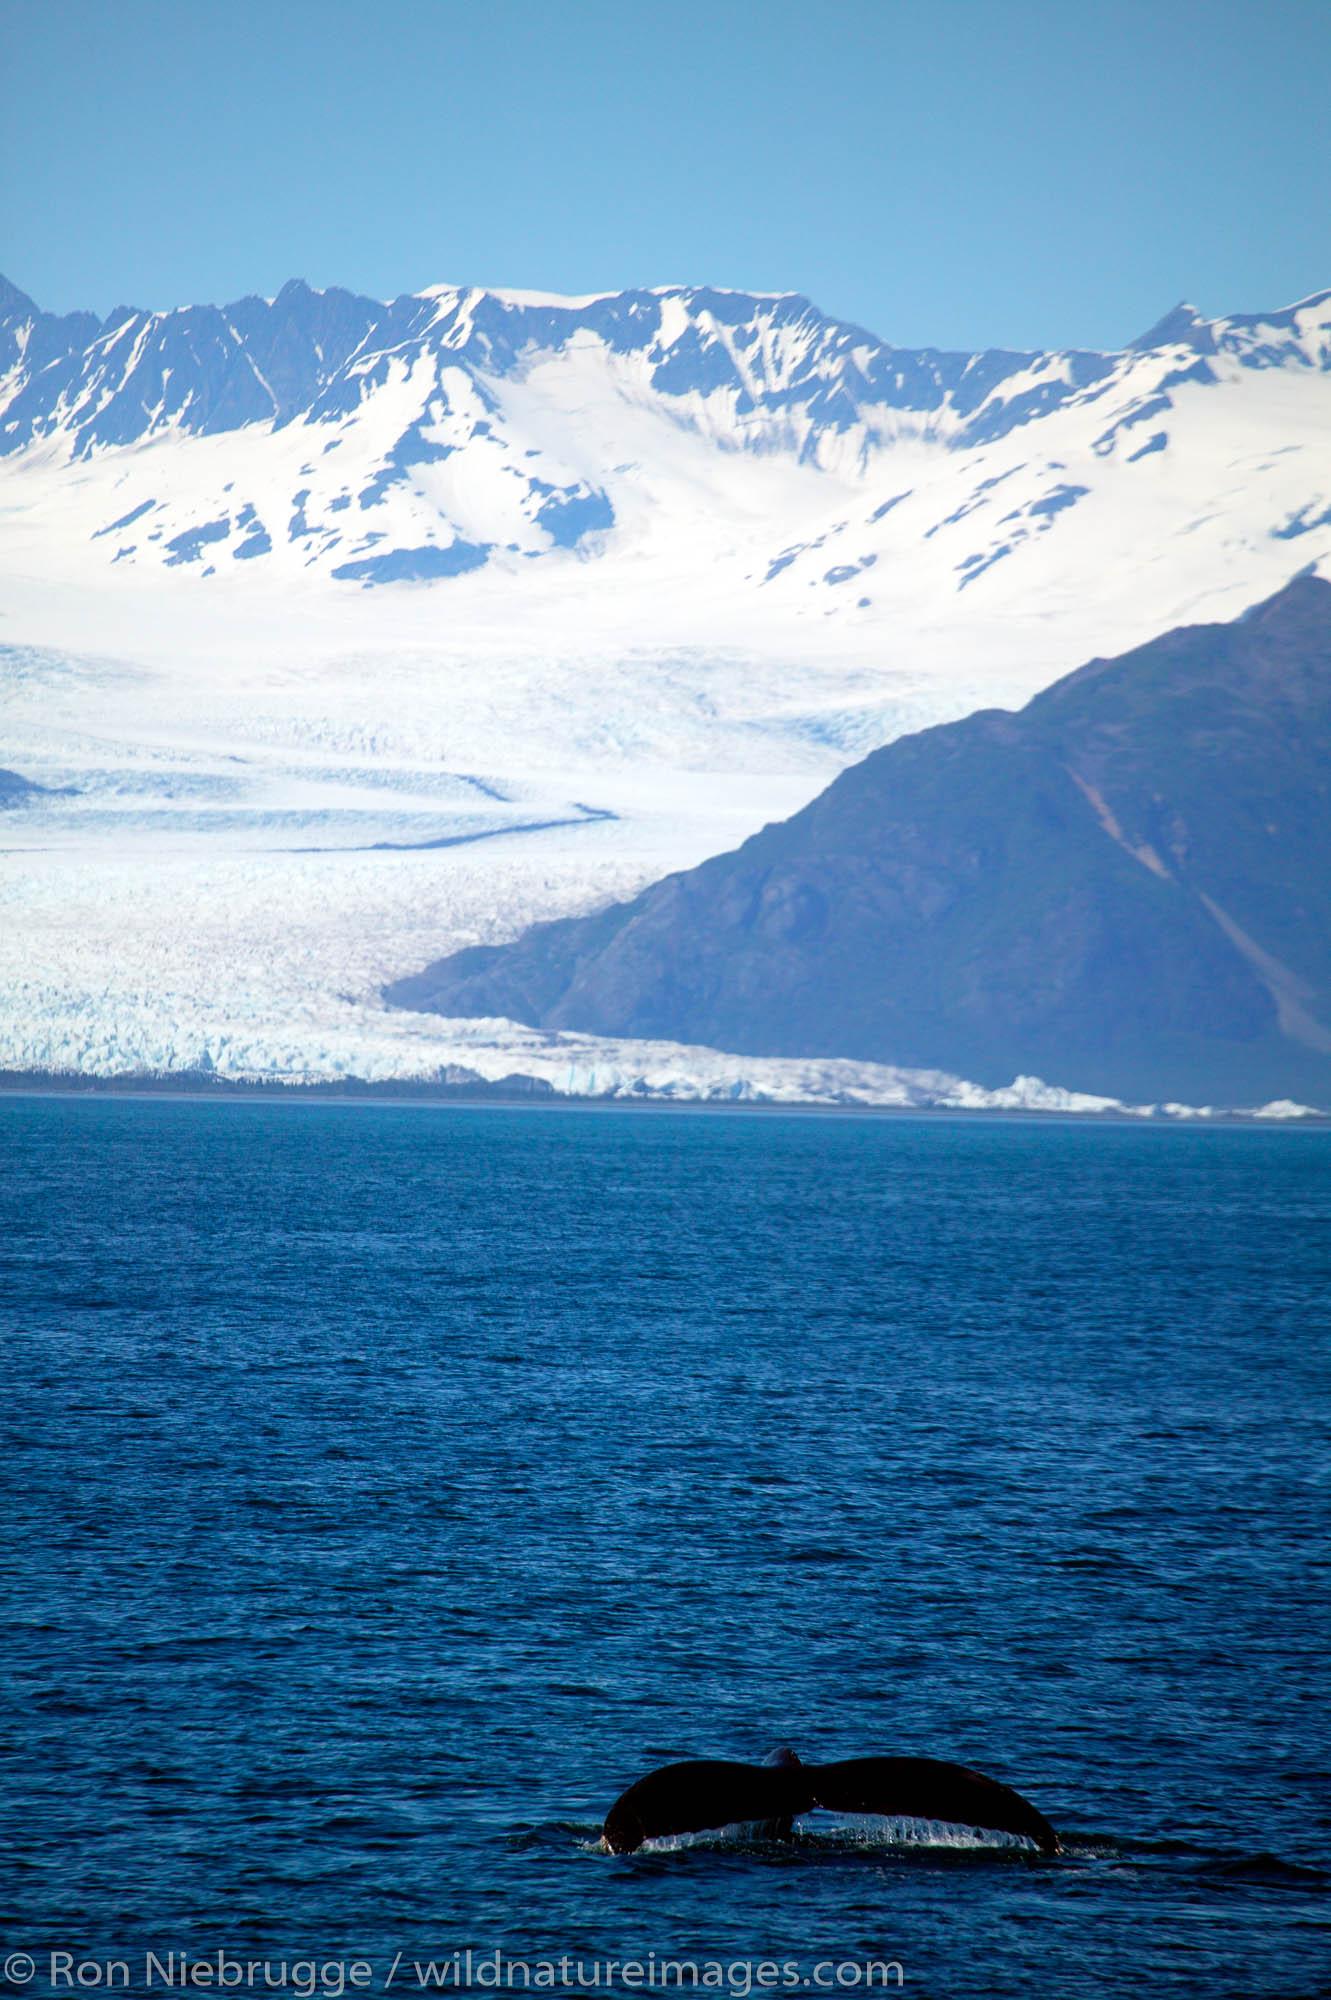 Humpback whale in front of Bear Glacier, on Major Marine Tour on Resurrection Bay, near Seward, Alaska.